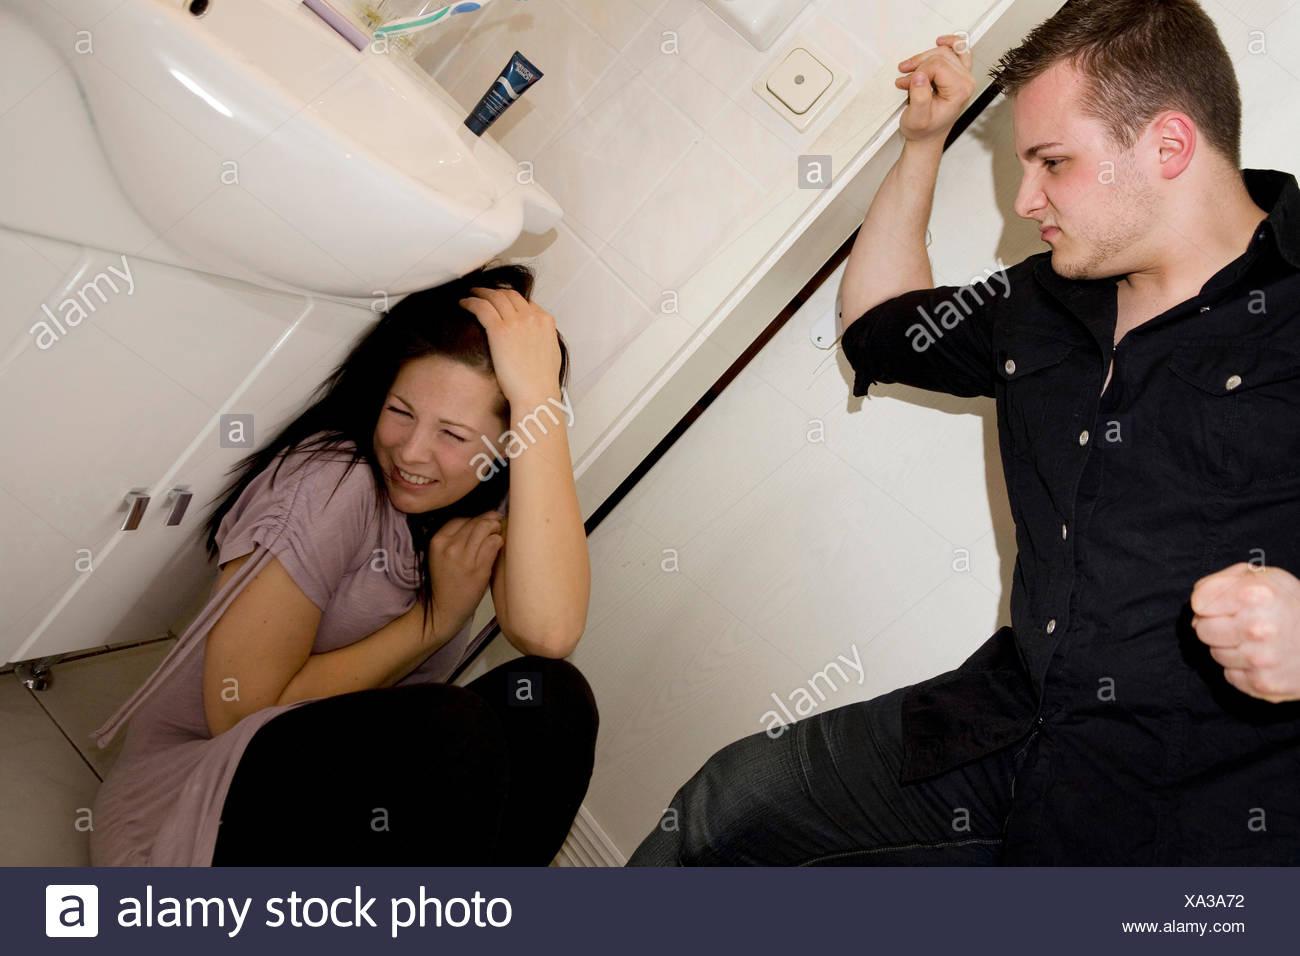 youn man beating young woman in bathroom Stock Photo